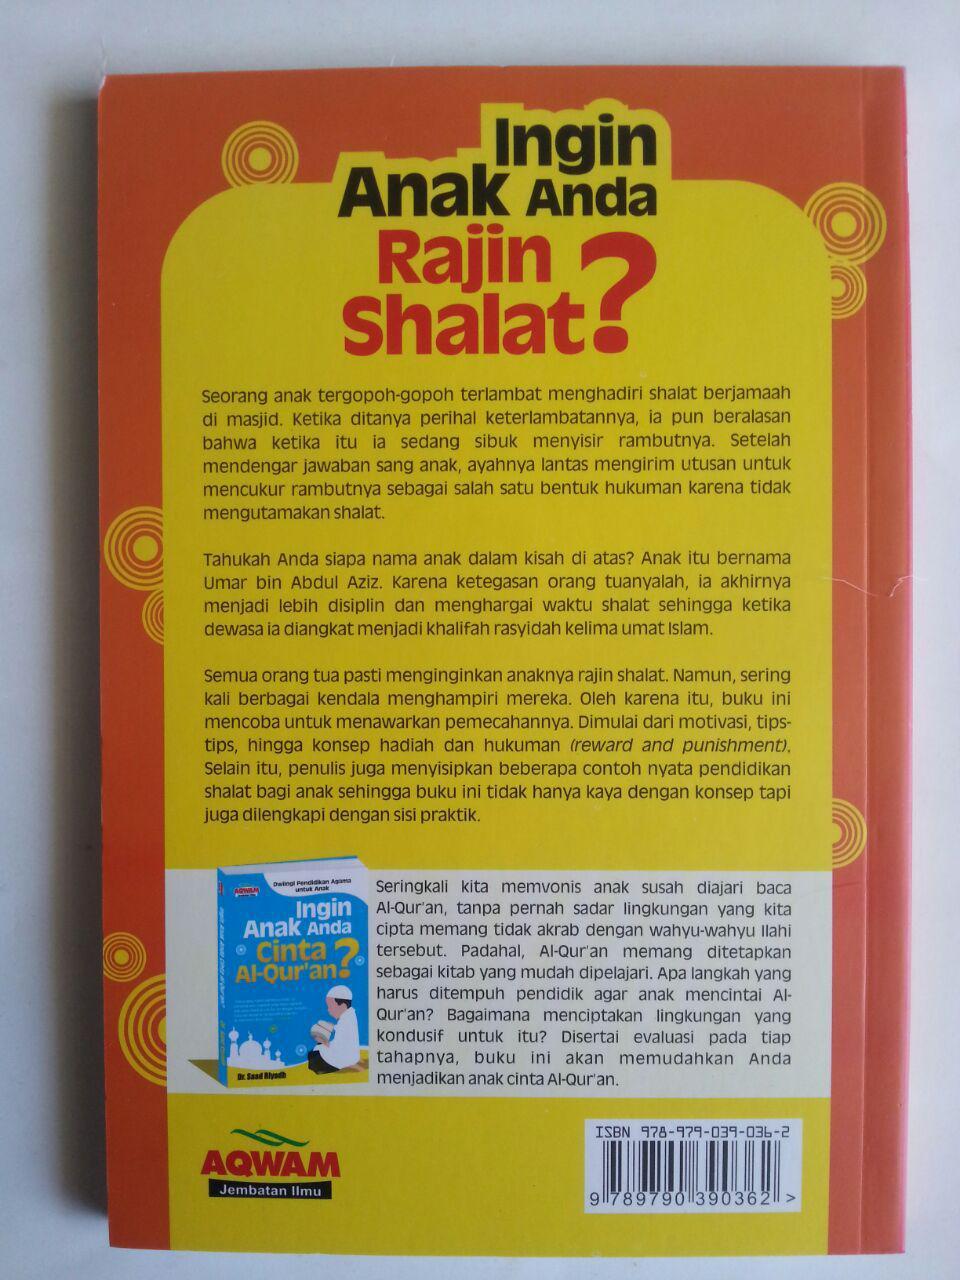 Buku Ingin Anak Anda Rajin Shalat Pendidikan Agama Untuk Anak cover